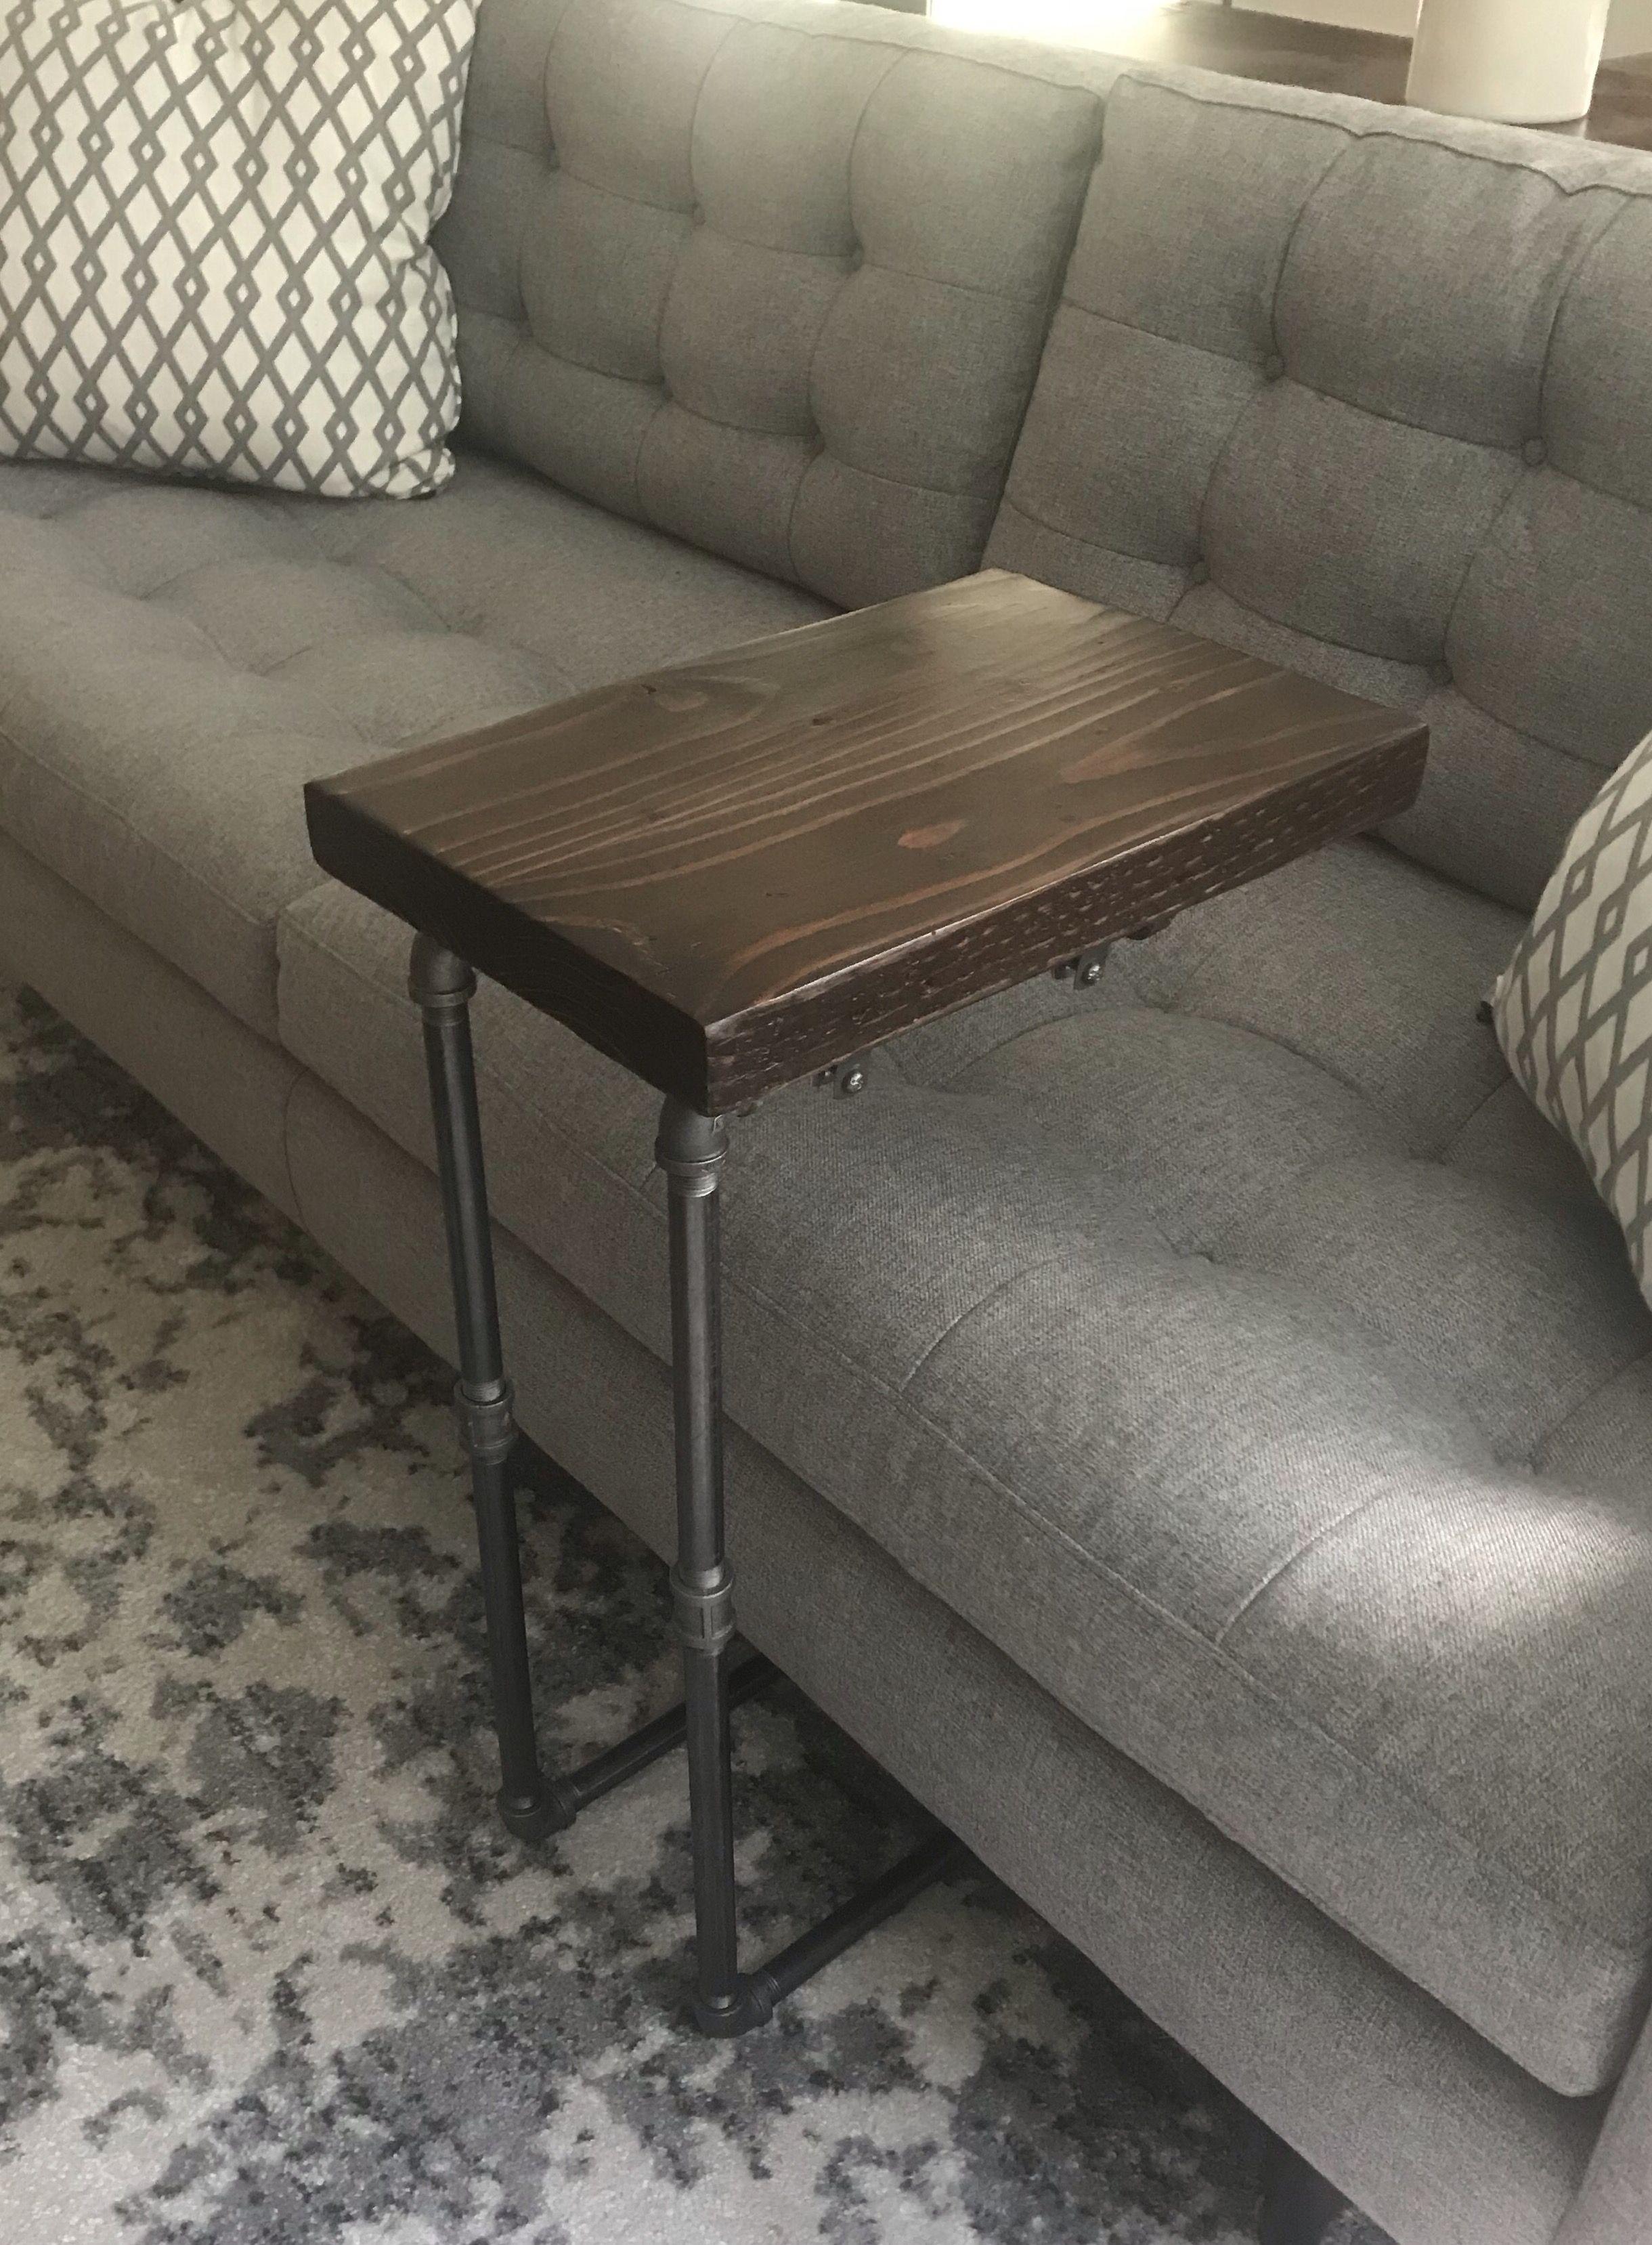 Reclaimed wood c table dark espresso finish black iron pipe base wrenchmaven etsy com